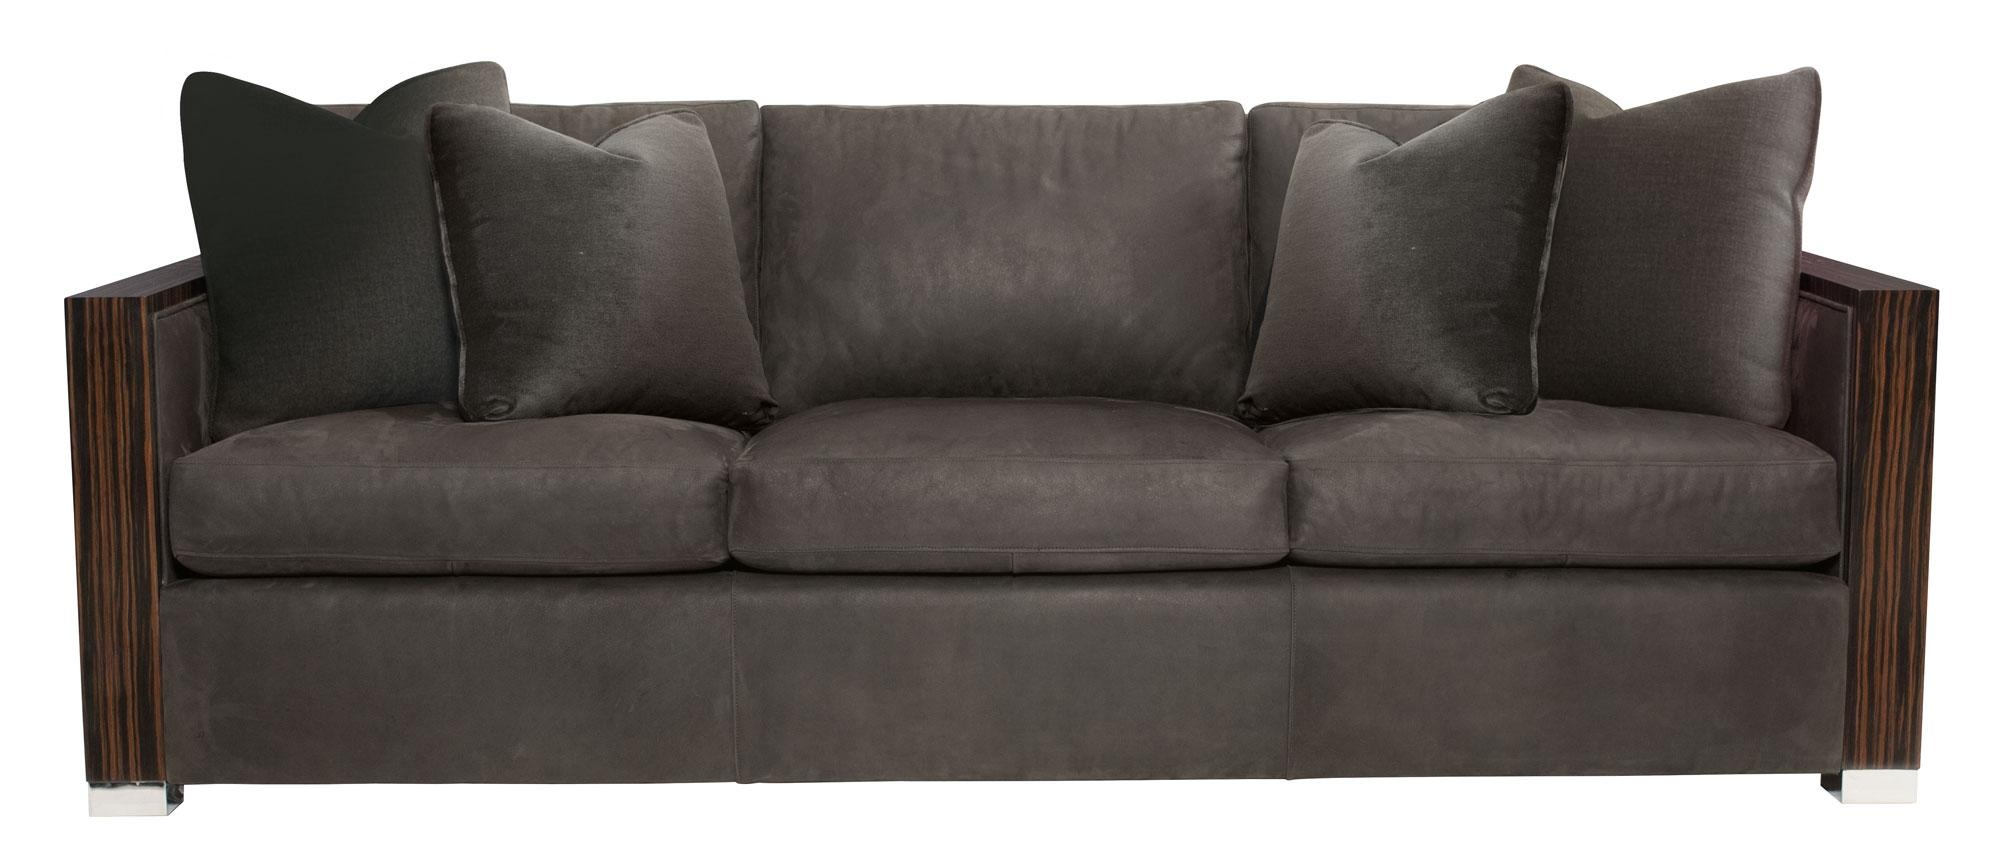 Bernhardt Tarleton Sofa With Ideas Design 25417 | Kengire Throughout Bernhardt Tarleton Sofas (Image 7 of 20)